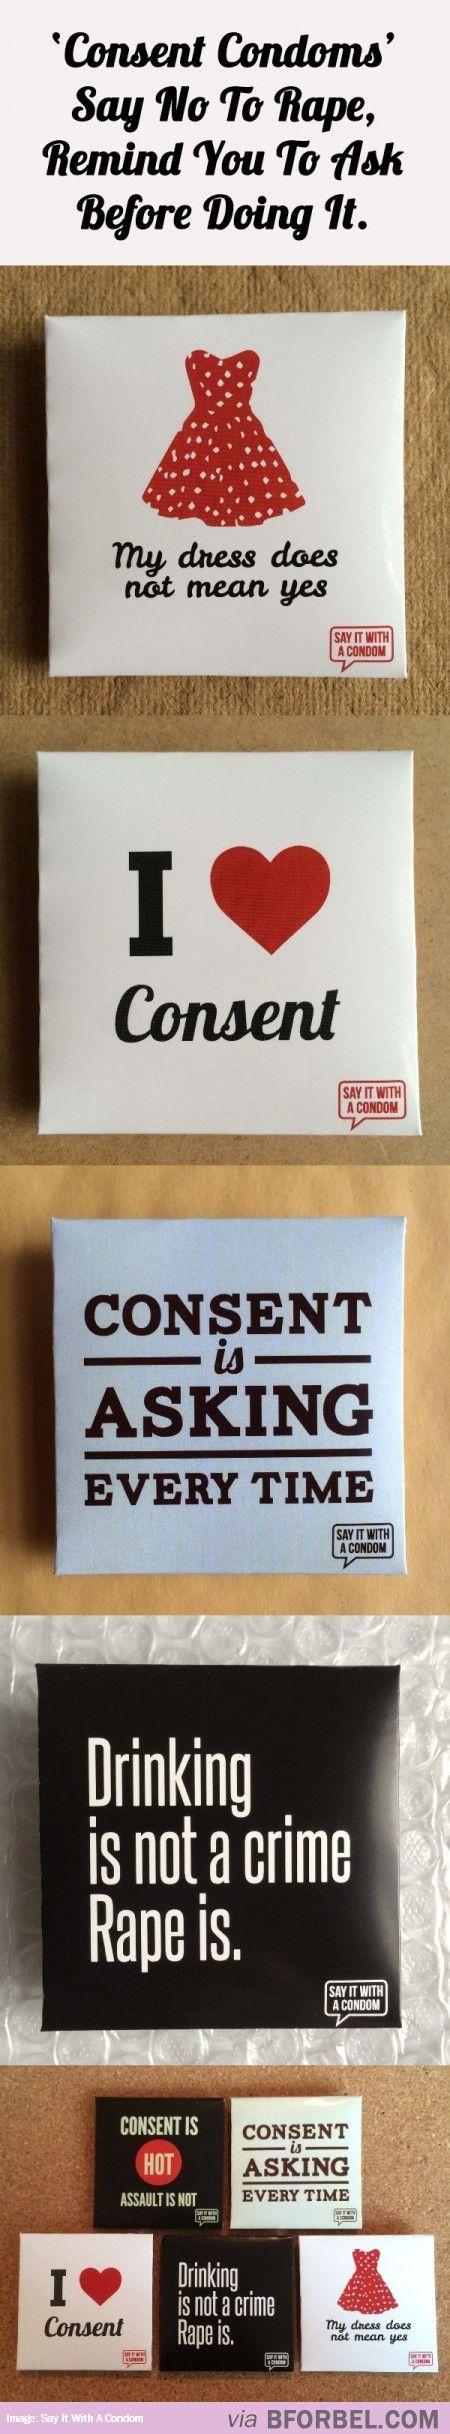 Consent Condoms That Say No To Rape…